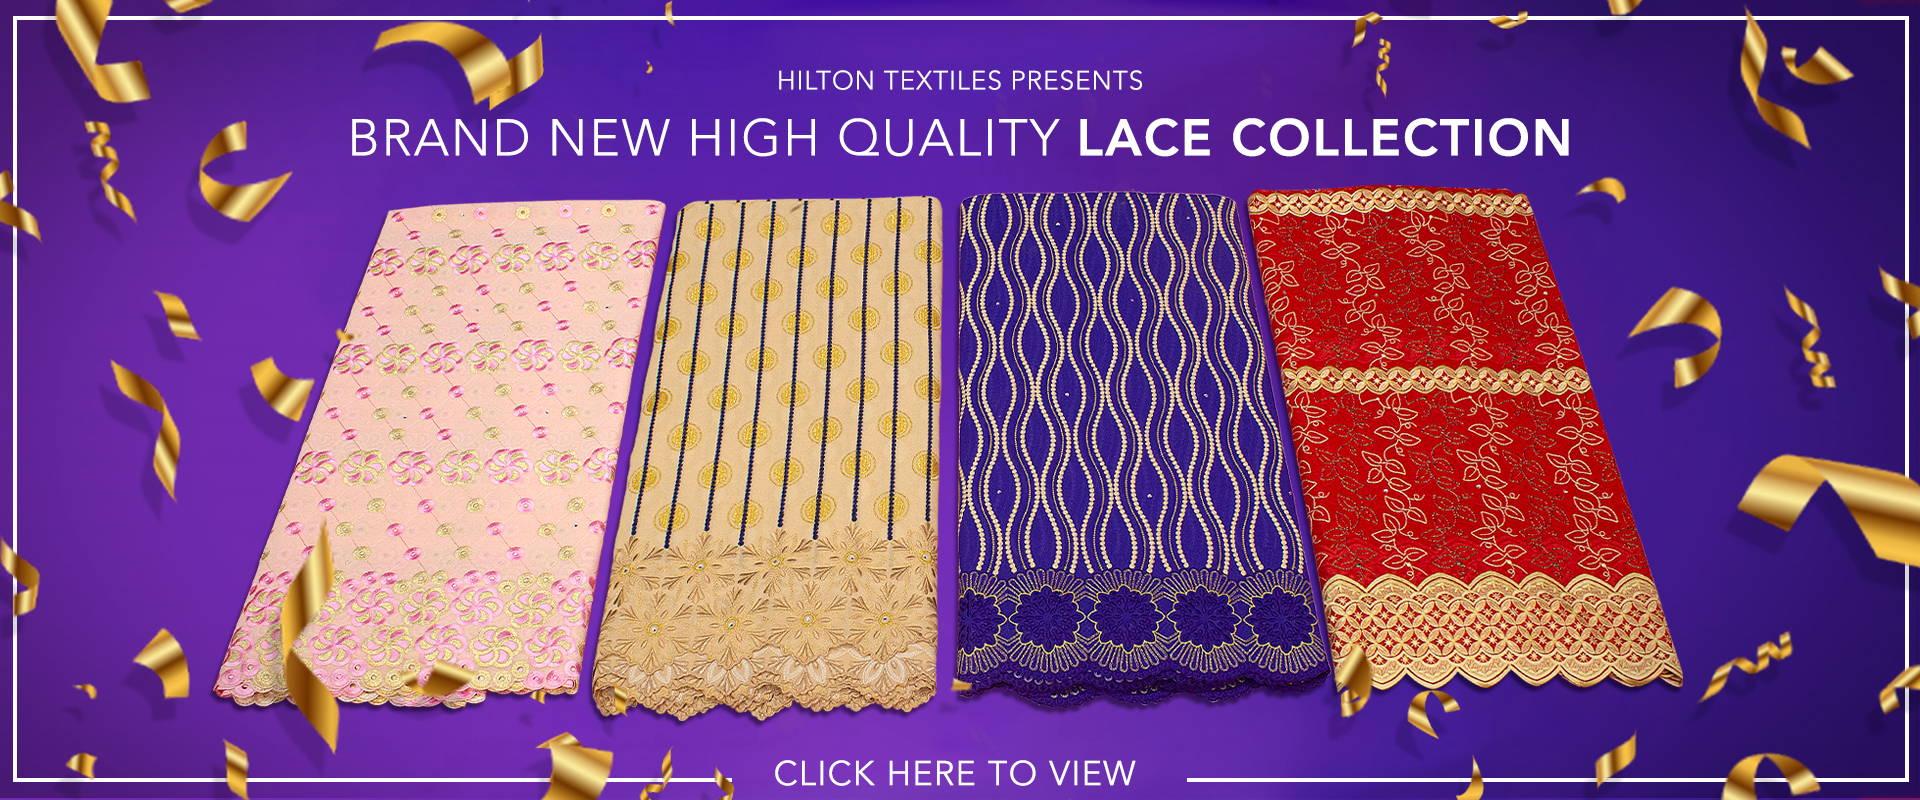 setup a wholesale account with hilton textiles. click here